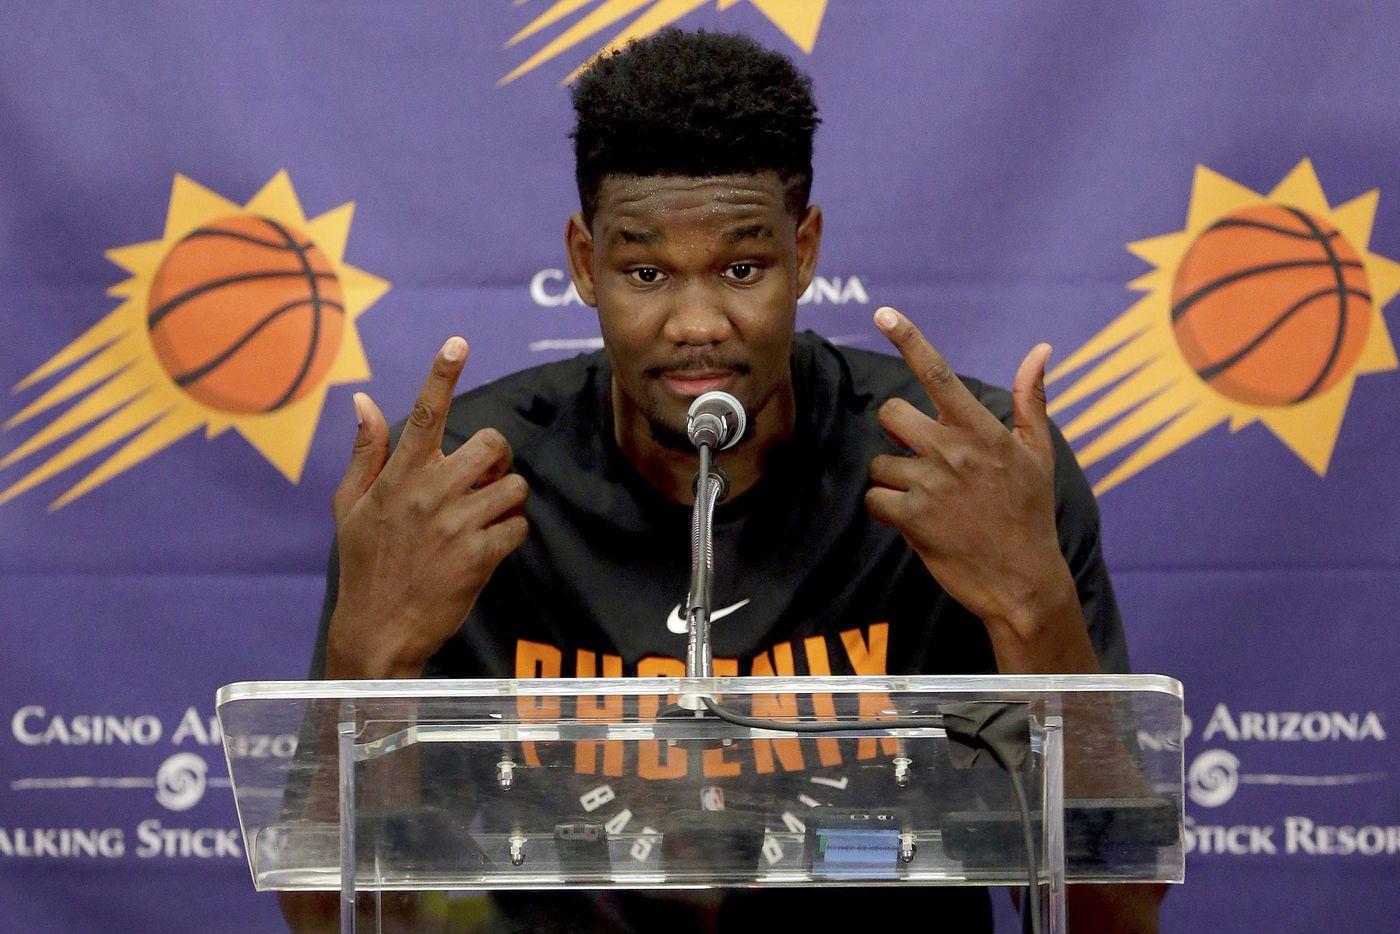 NBA draft: Deandre Ayton leads crew of big-man prospects